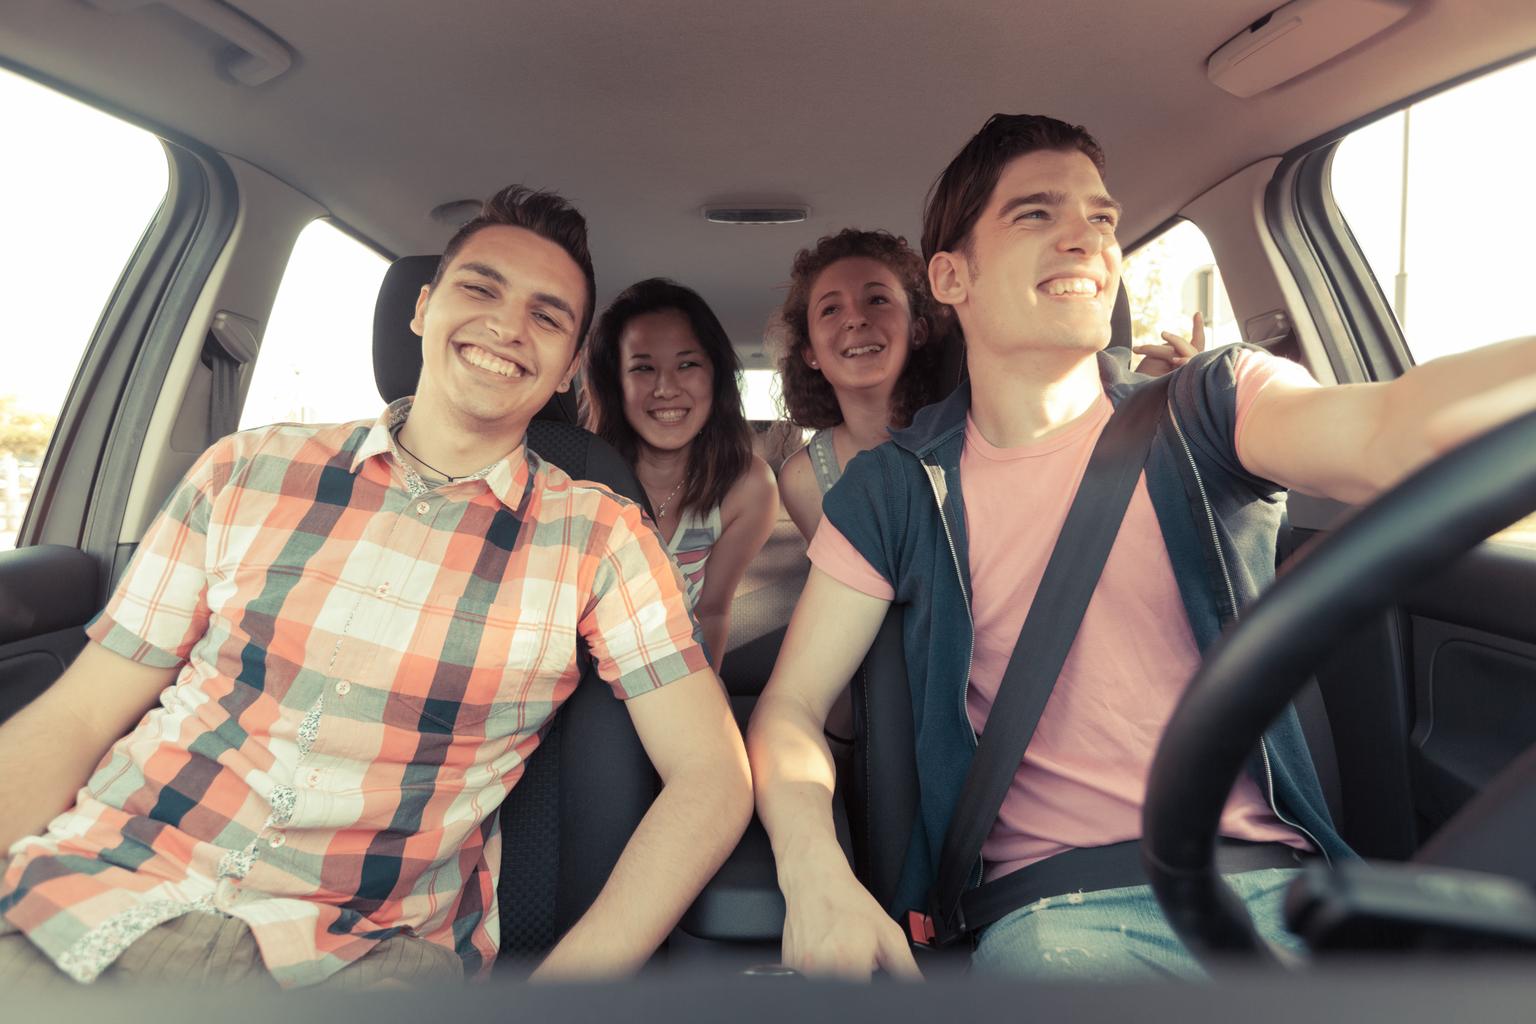 stockphoto-fiatalok-telekocsi-auto-kocsi-lanyok-fiuk-.jpg